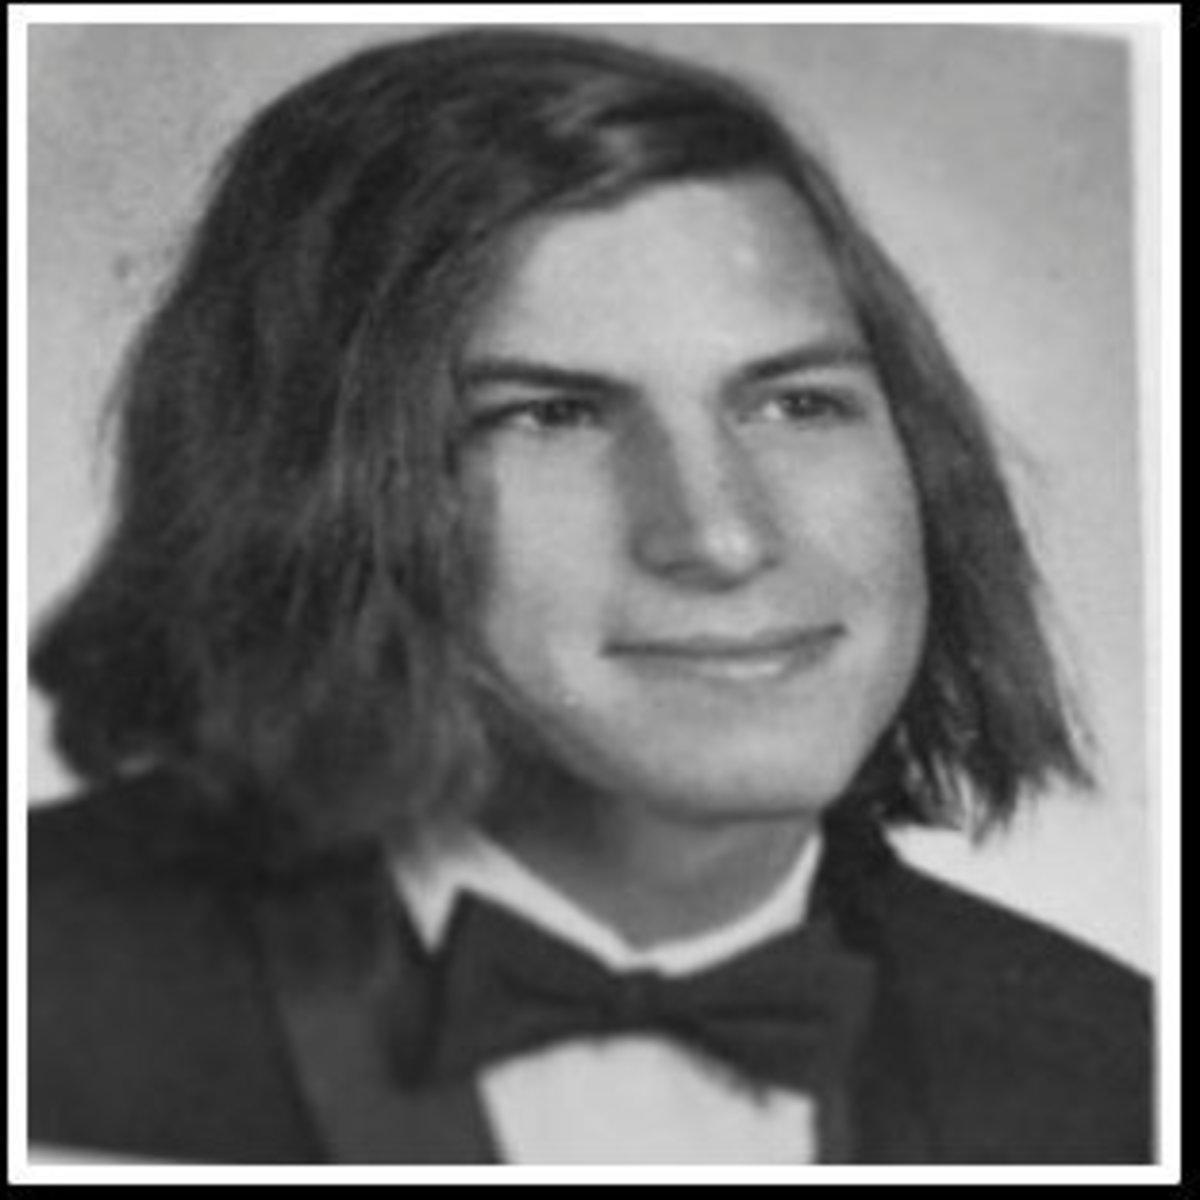 Steve Jobs -1972 yearbook pix - high school senior at Homestead  High School in Cupertino, California